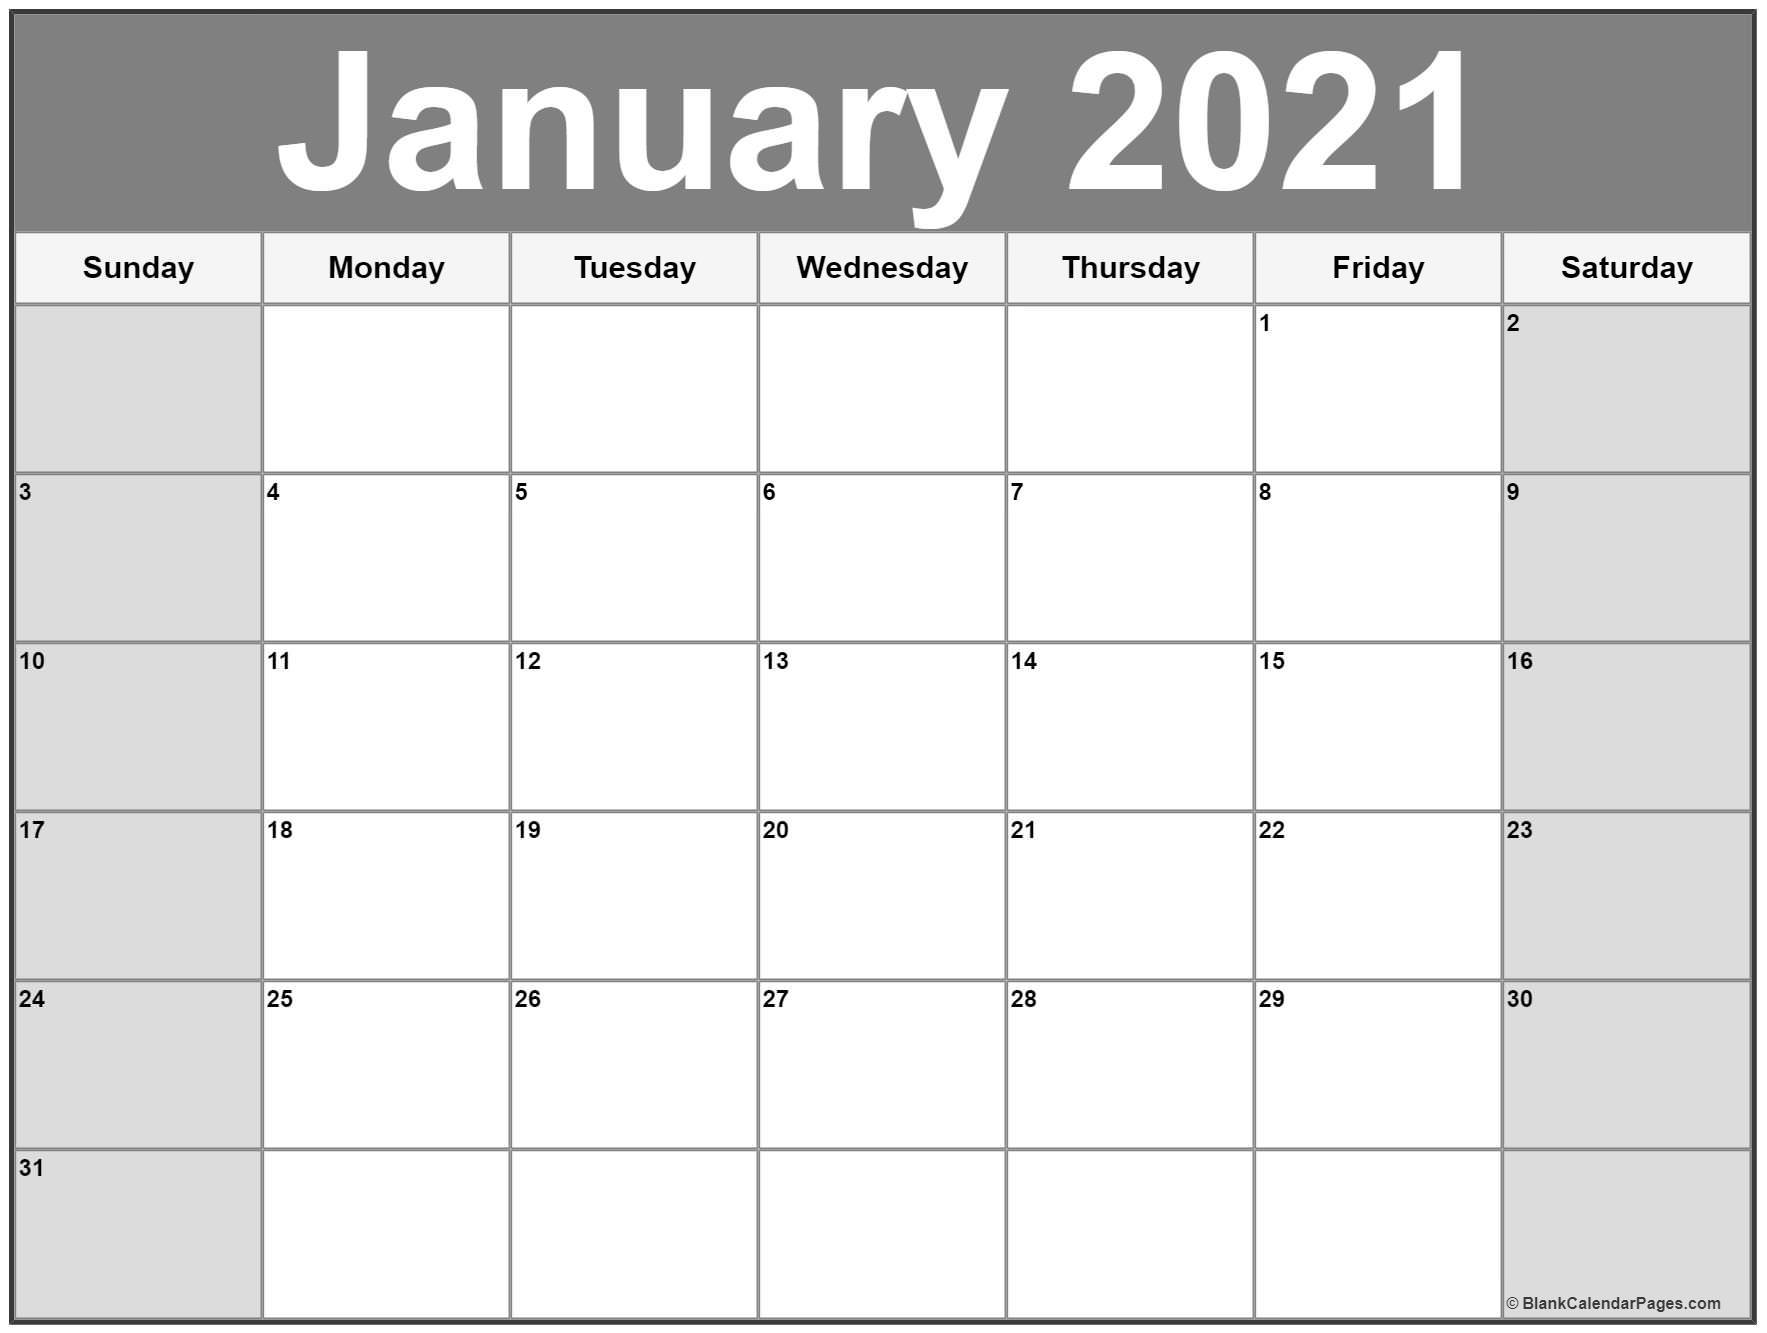 January 2021 Calendar Free Printable Monthly Calendars 3